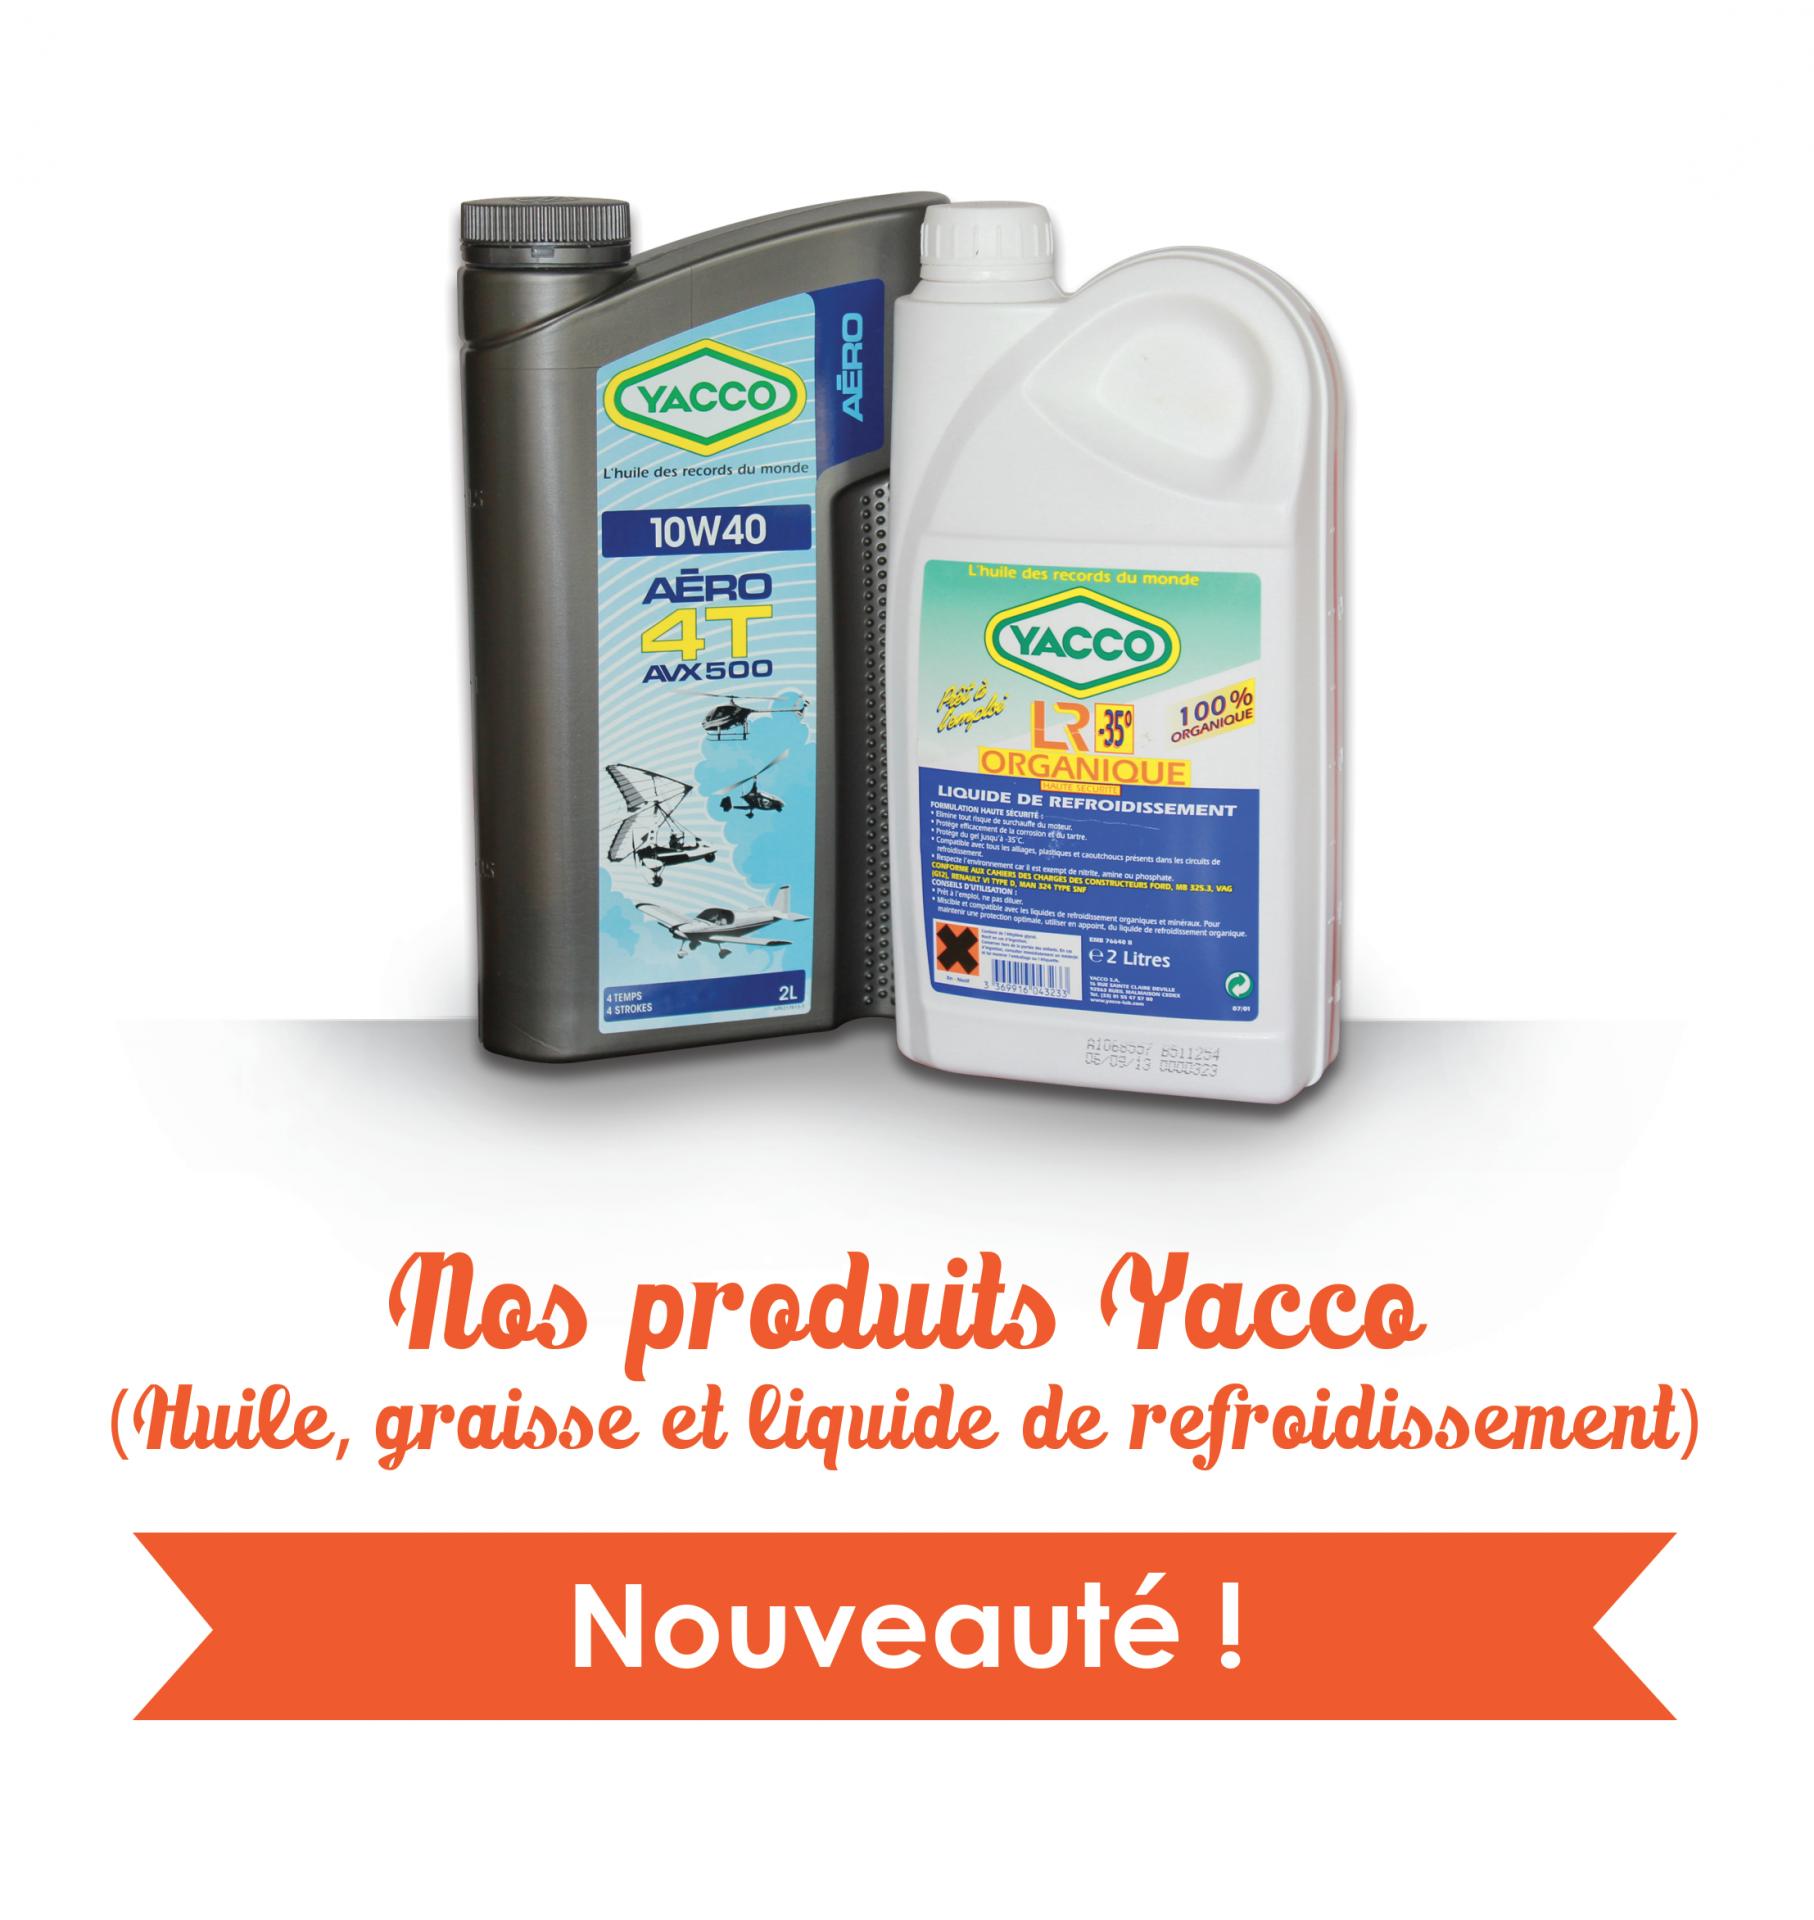 Produits yacco 3